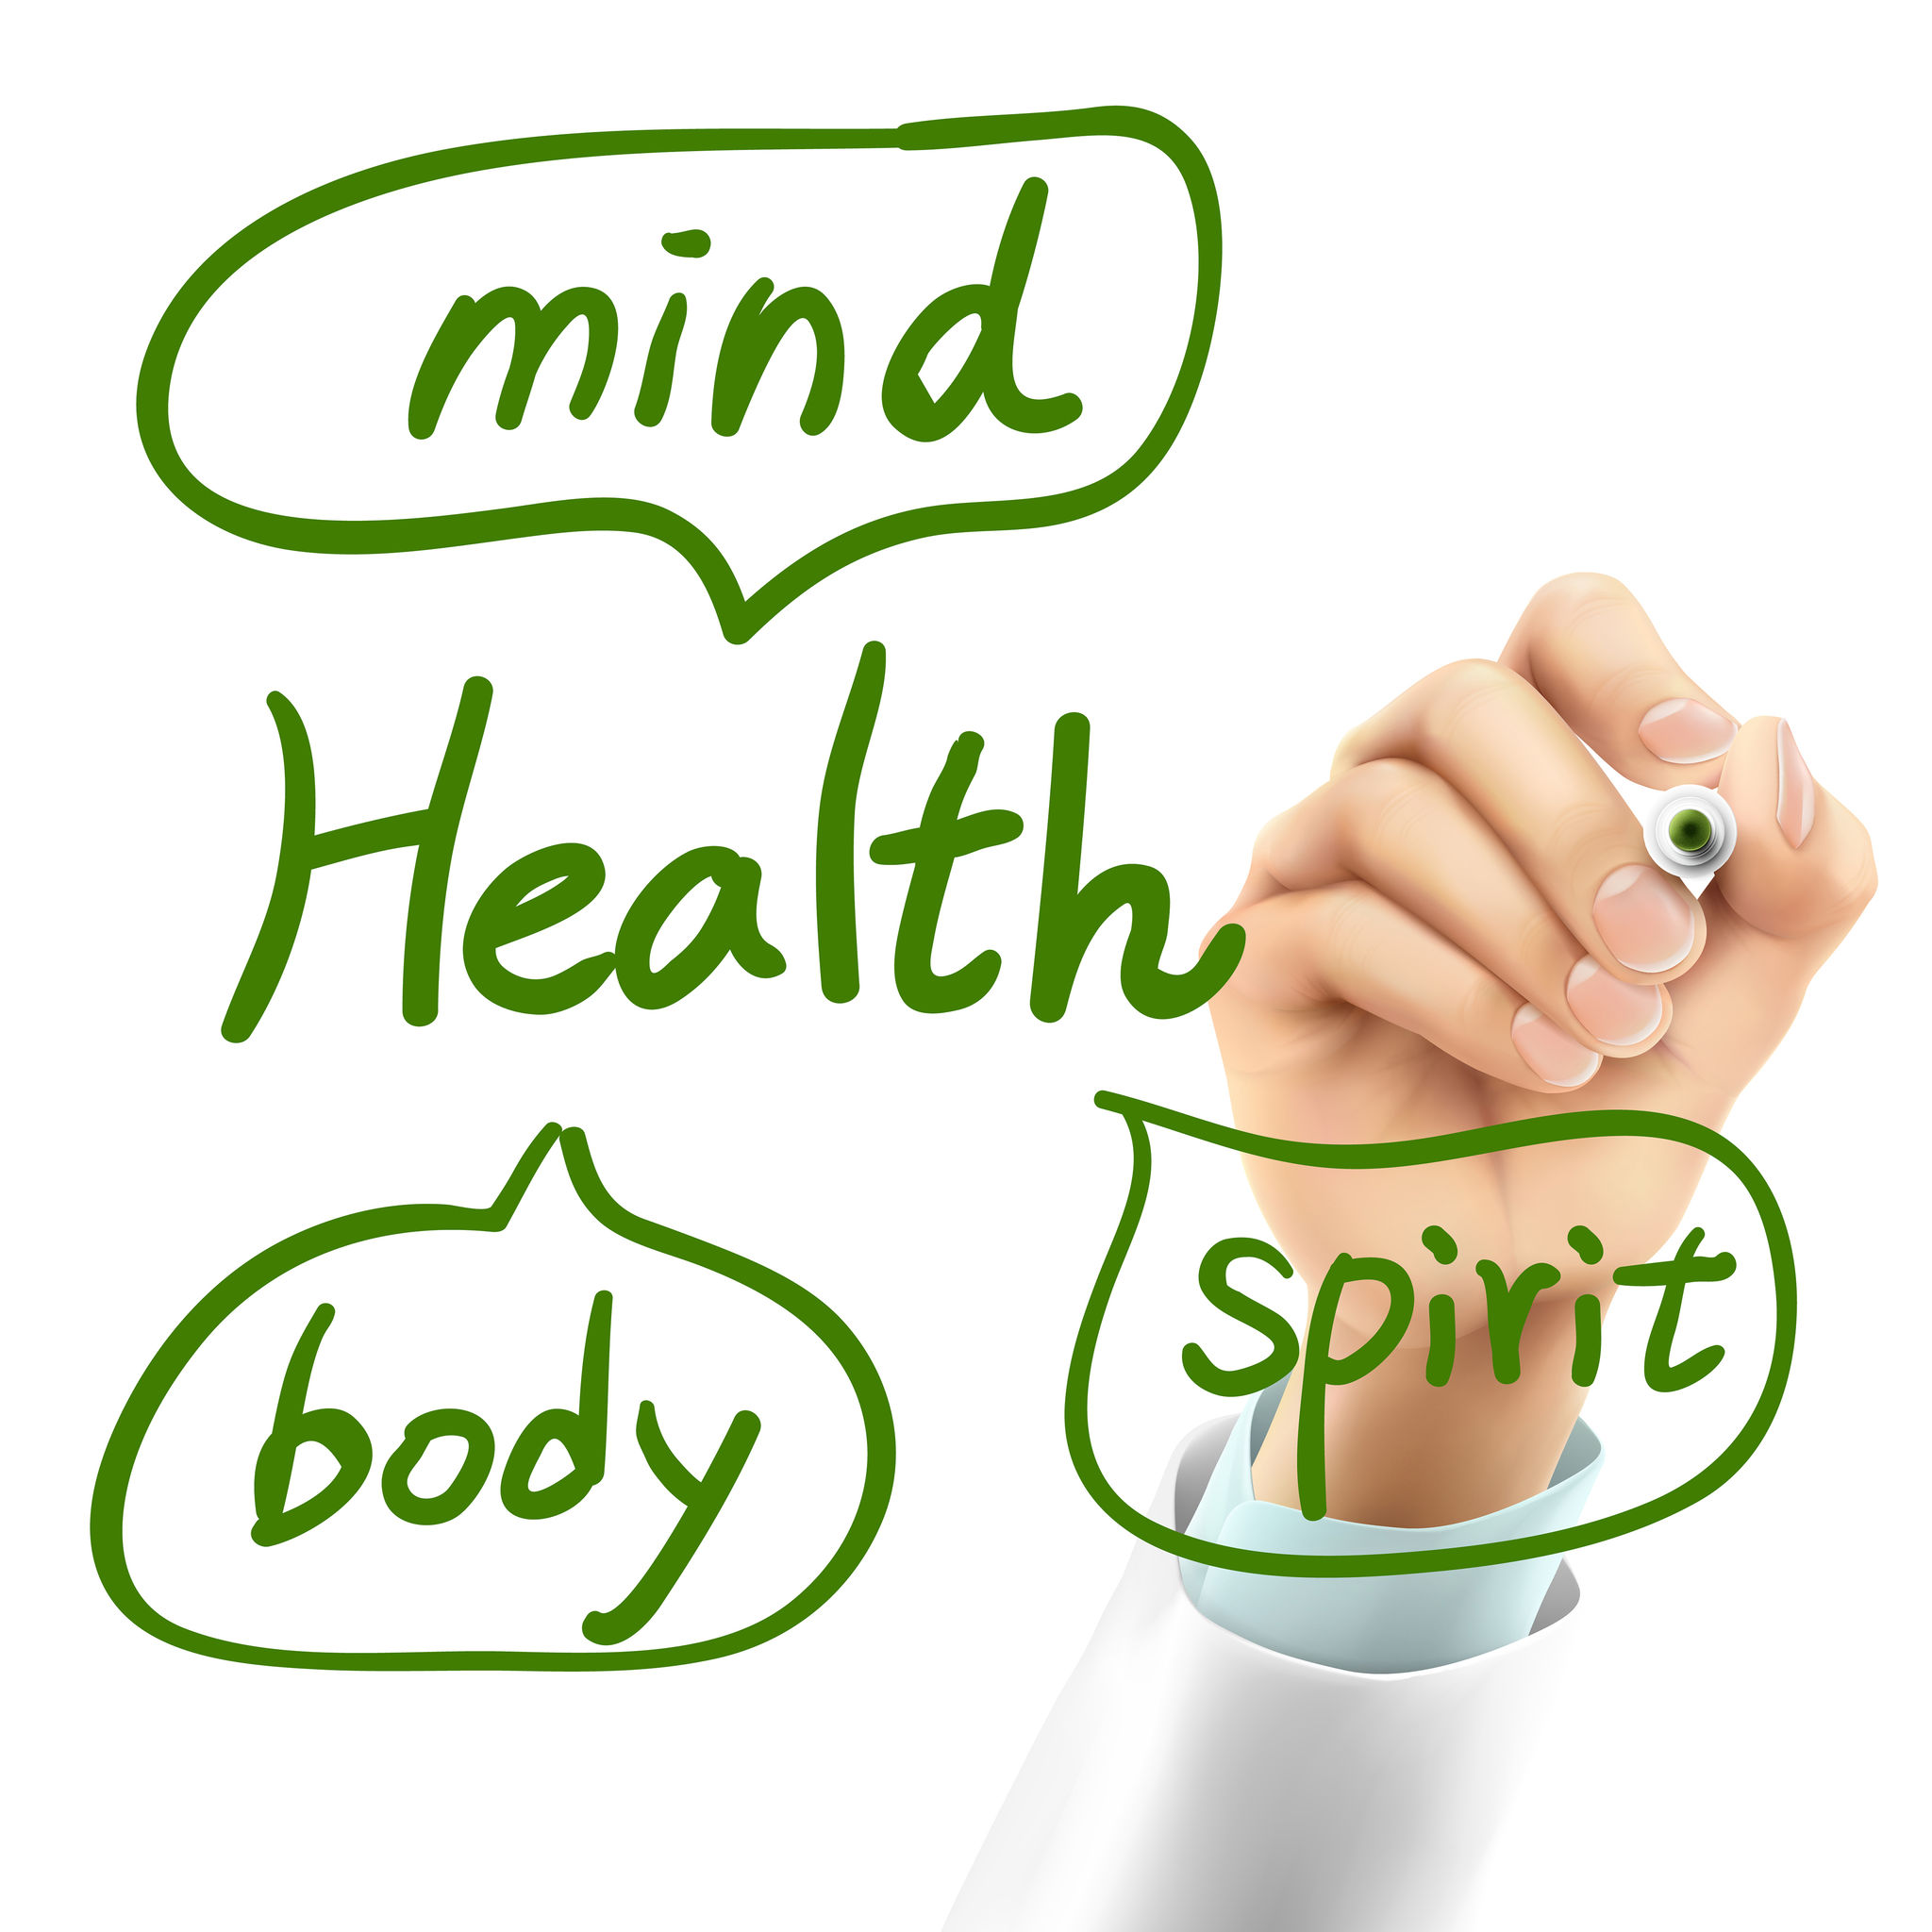 Mindful eating.  https://www.info-on-high-blood-pressure.com/mindful-eating.html